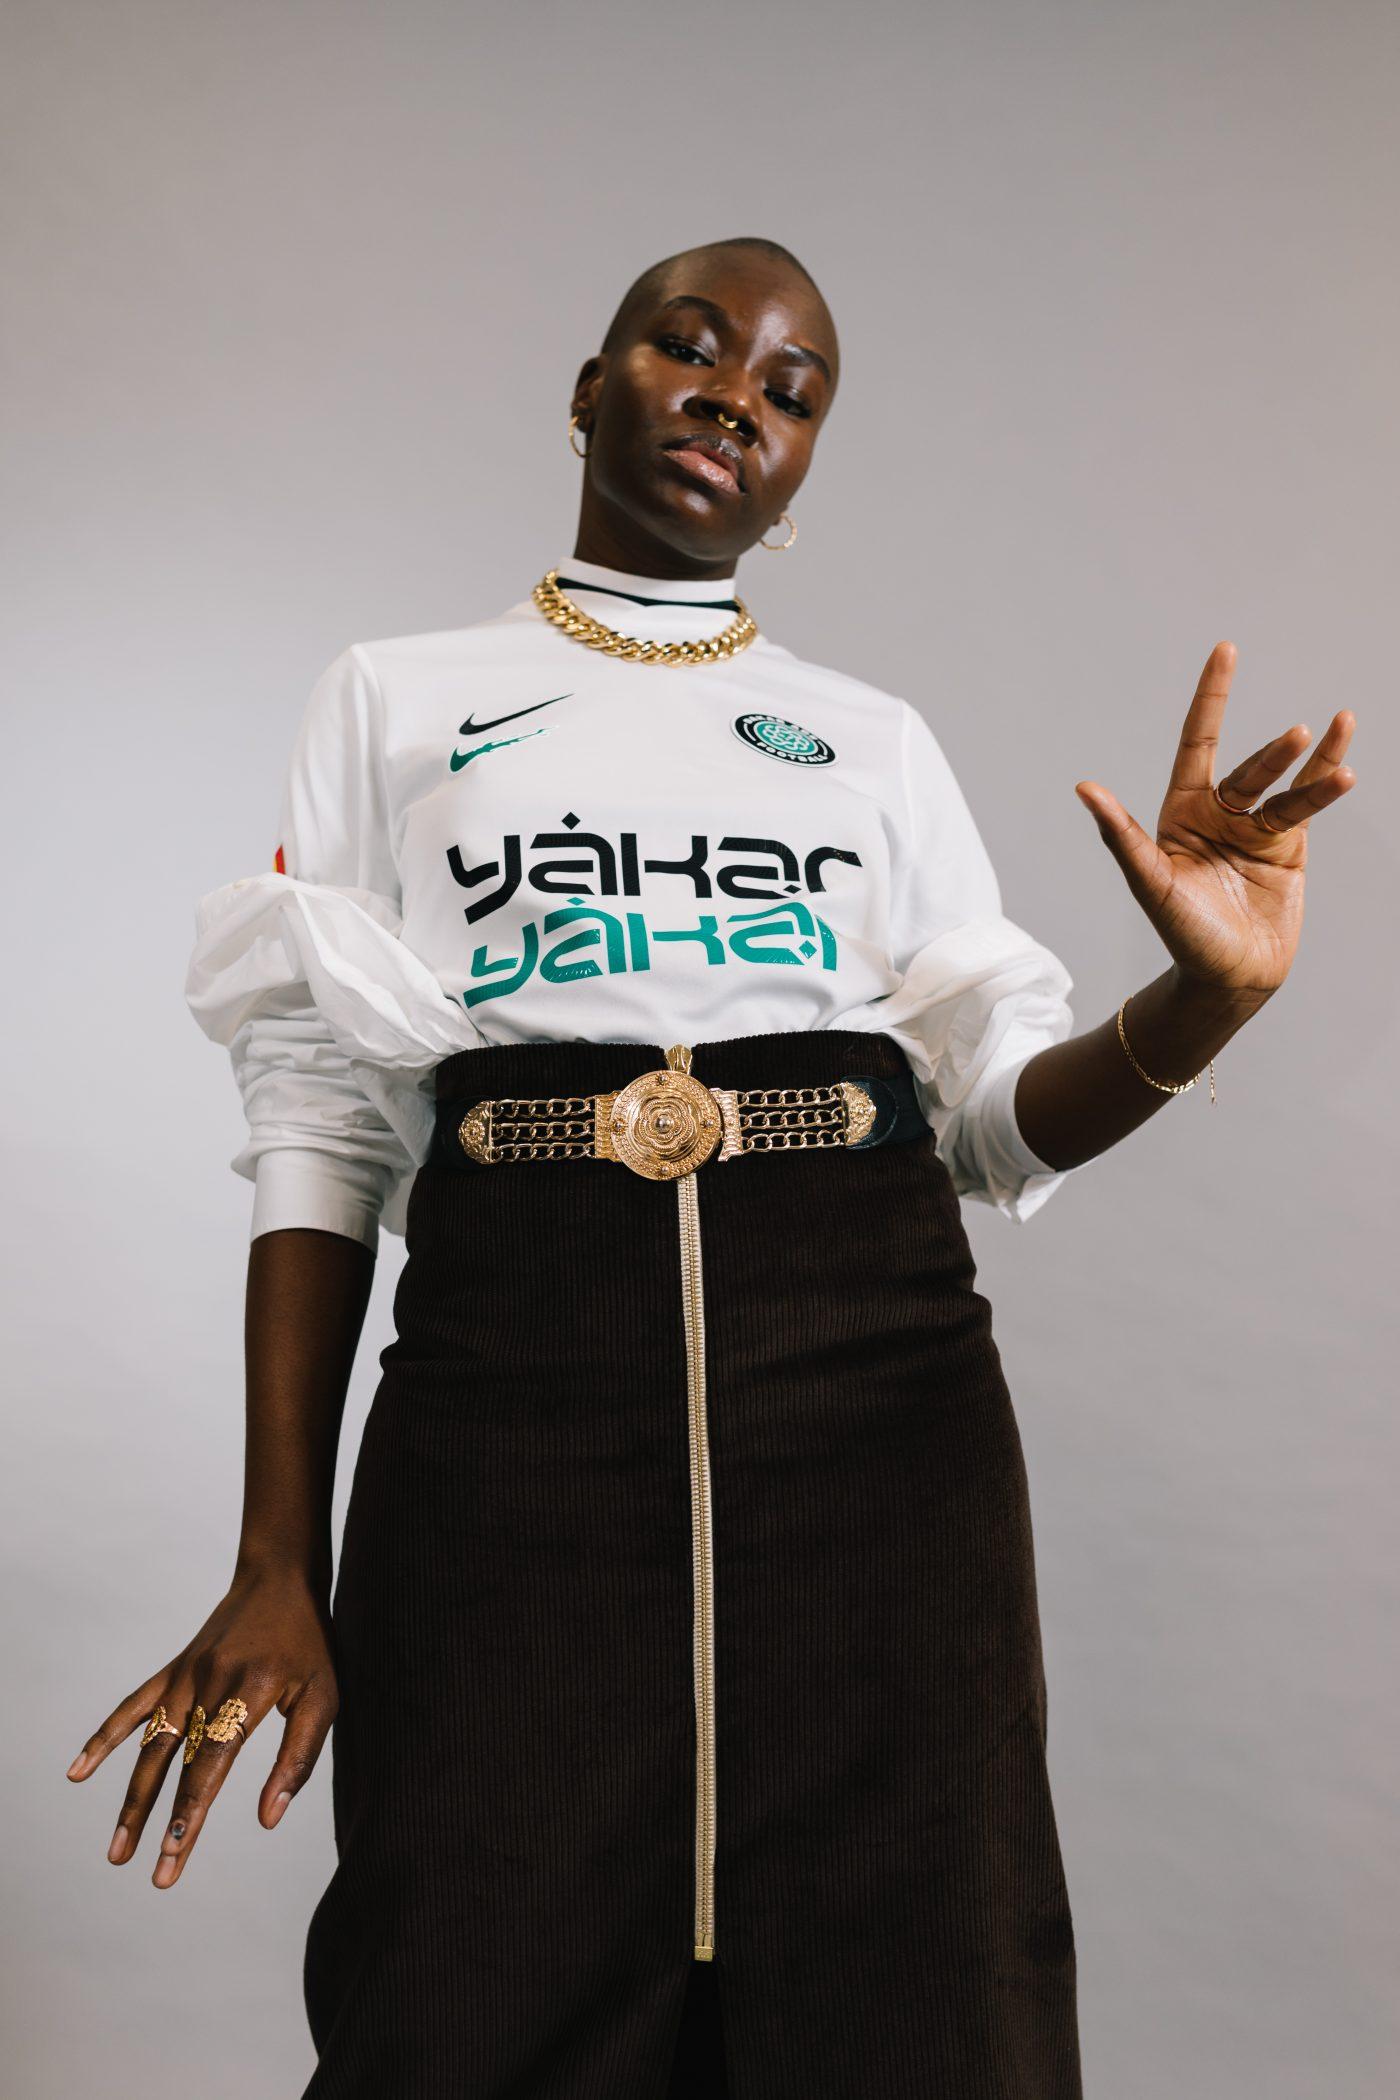 yakar-project-nike-nigeria-3